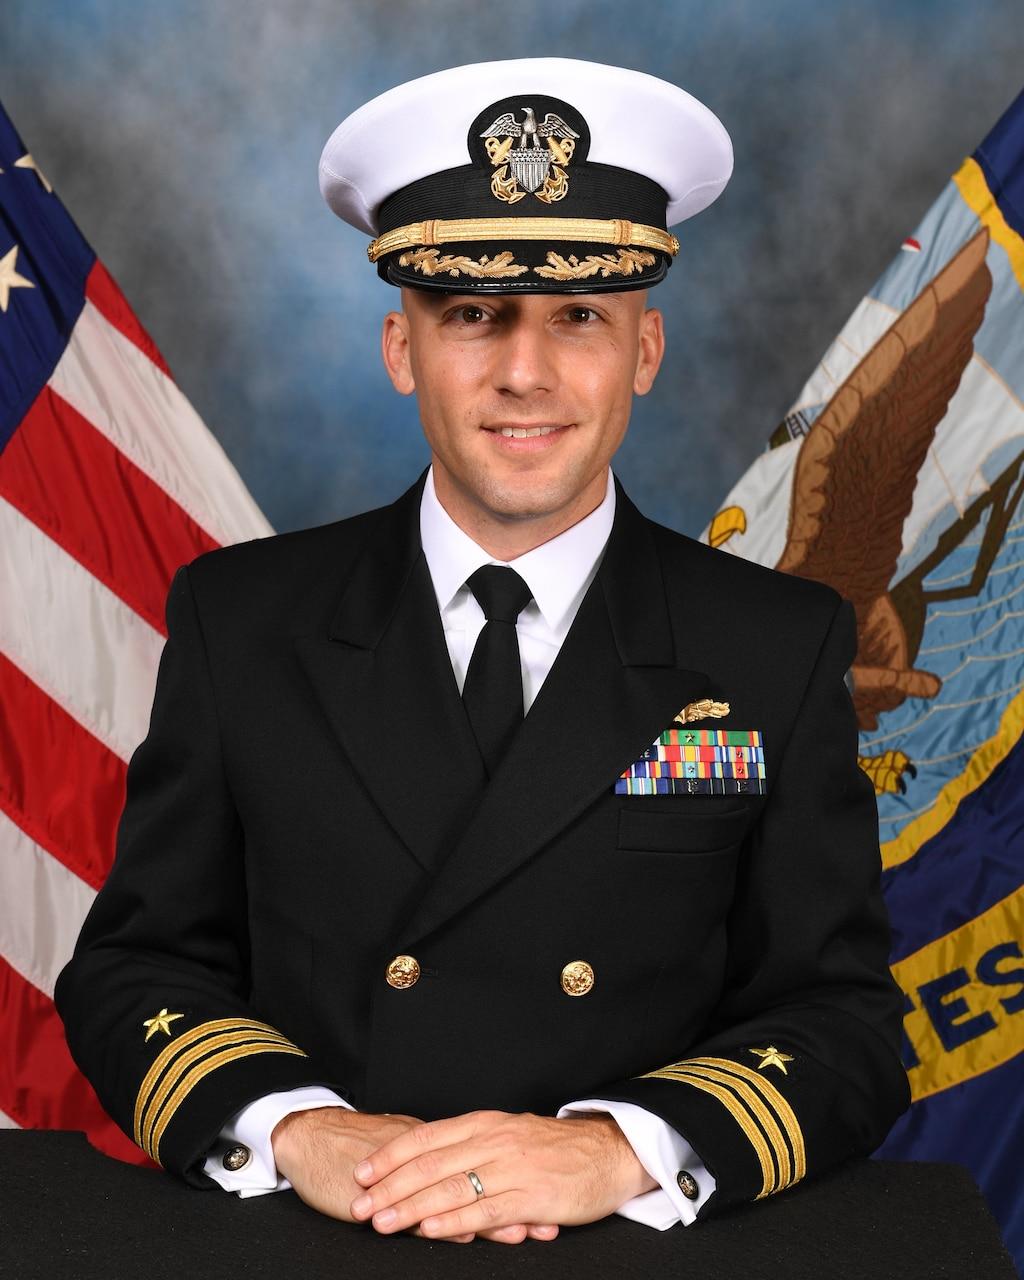 Commander Matthew R. Furtado